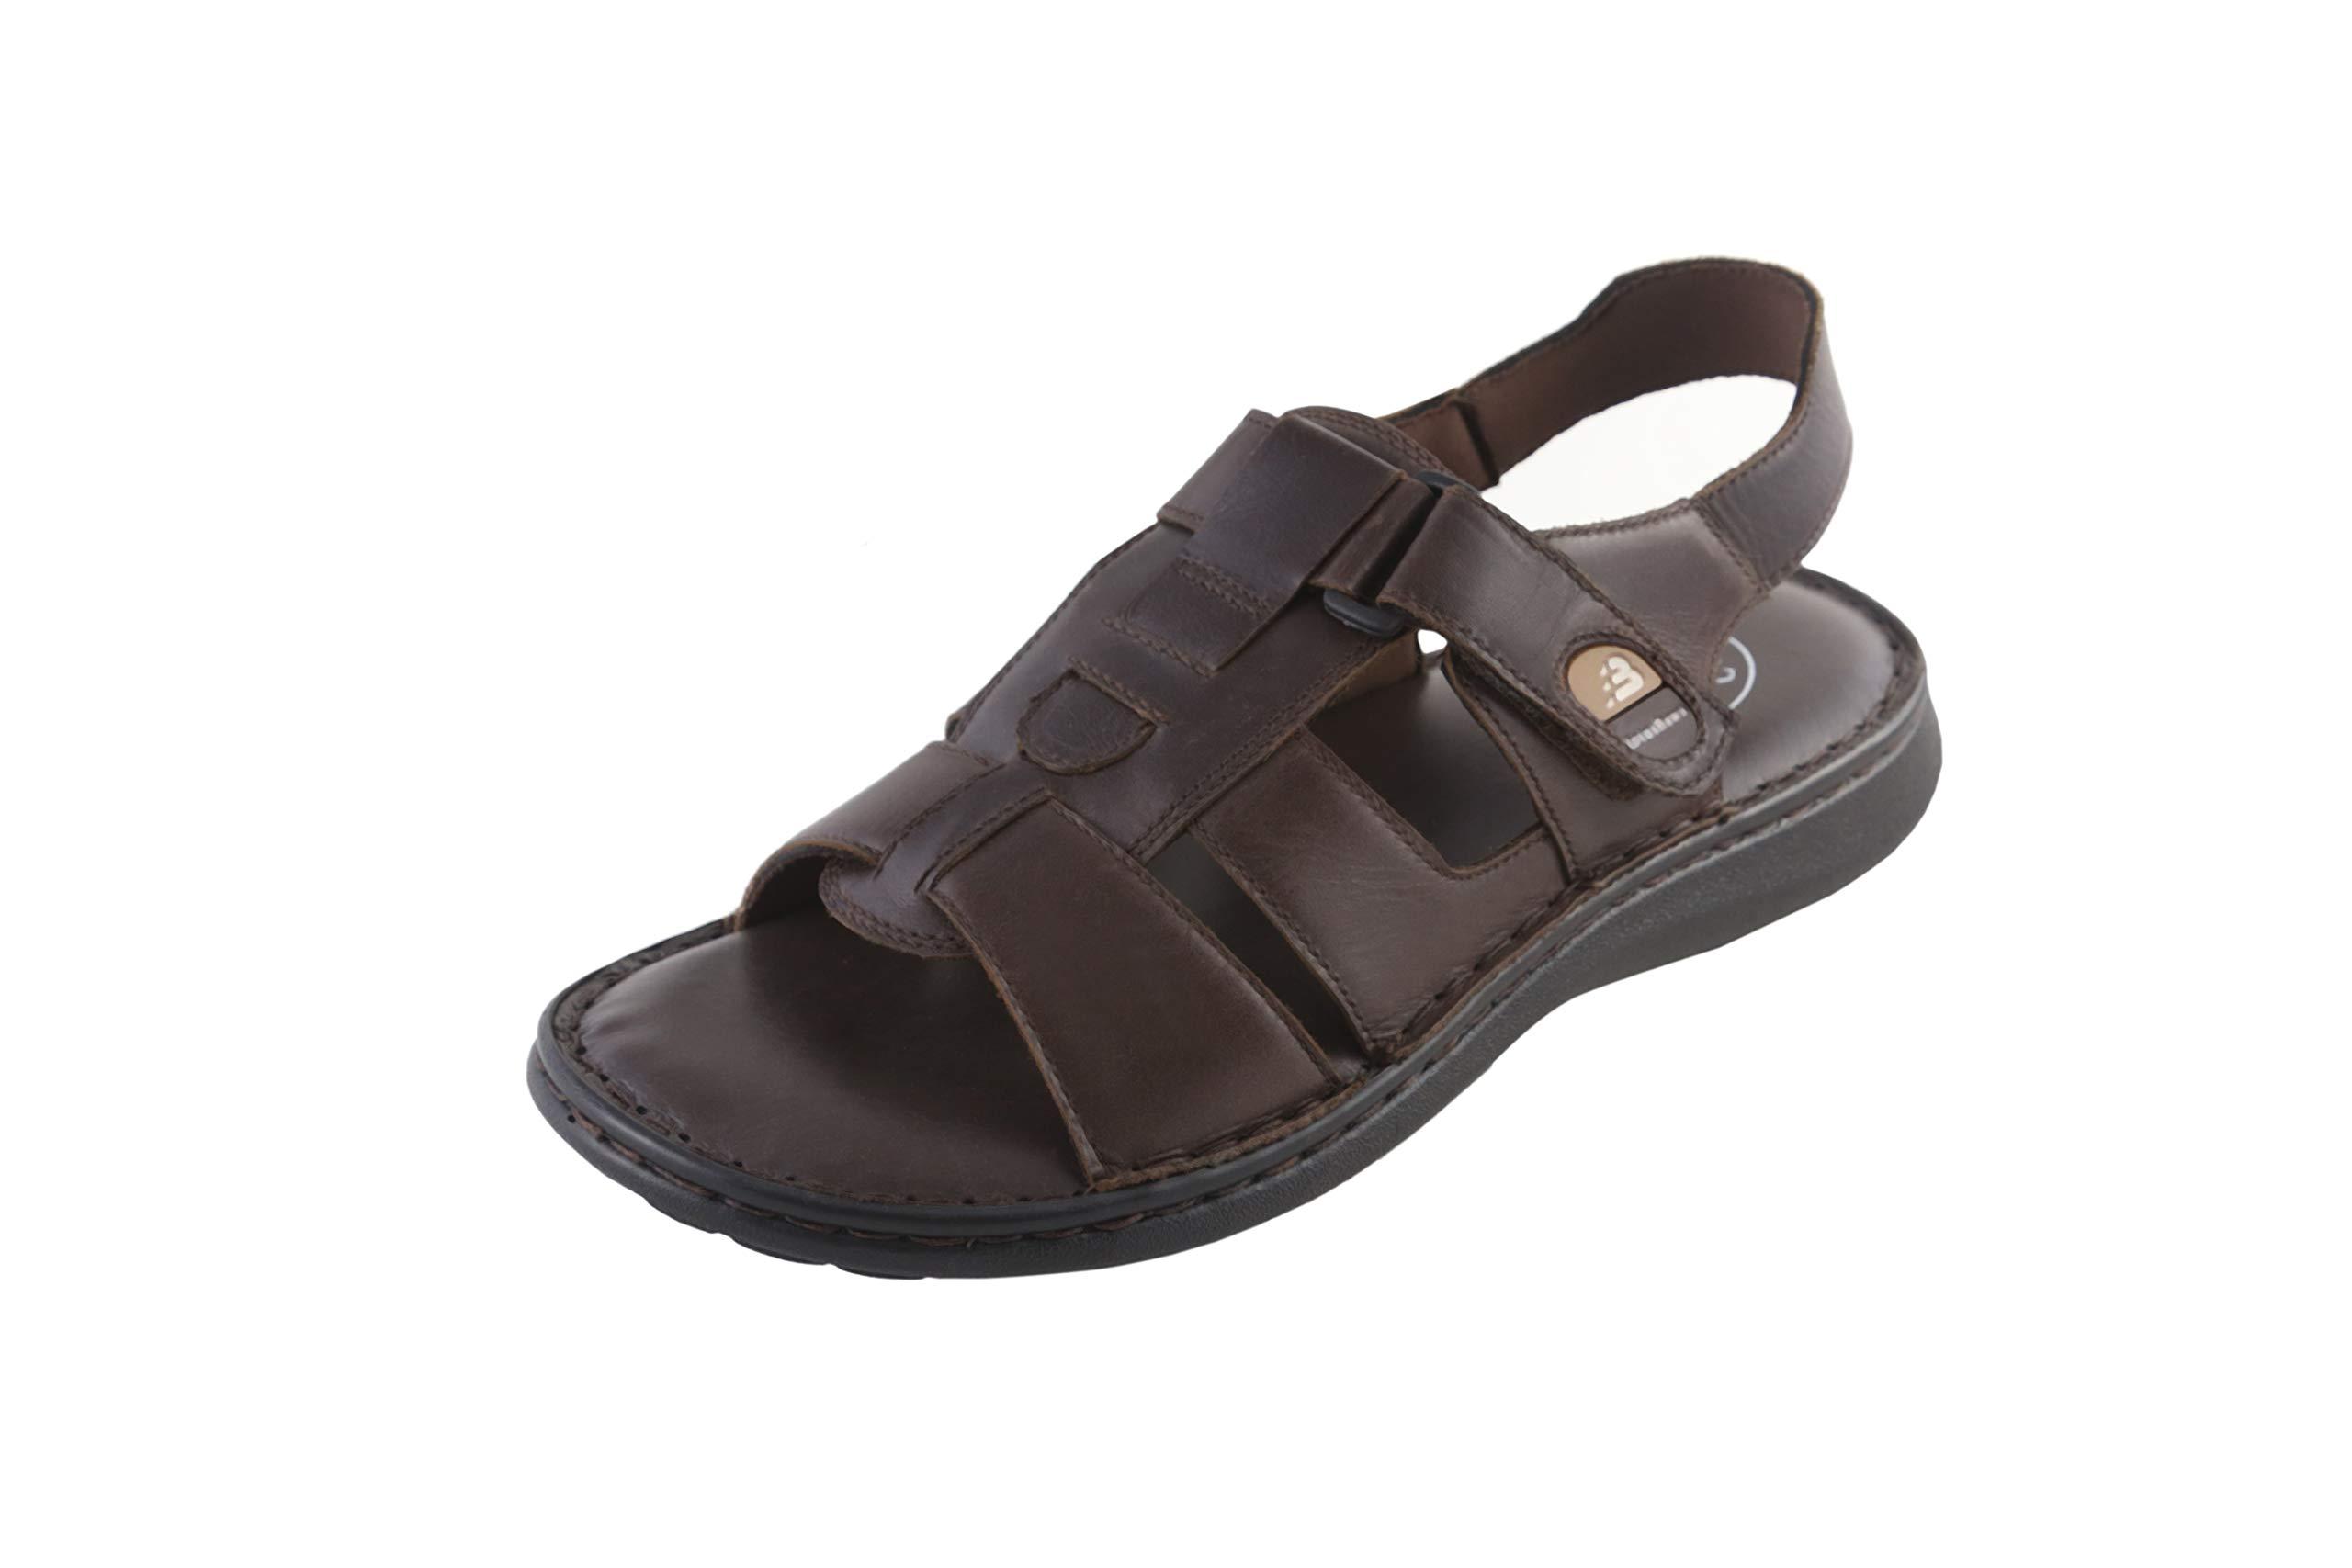 LOTUS BAWA Men's Fisherman Sandals Genuine Leather Breathable Open Toe Non-Slip Adjustable Summer Beach Wear Slippers-Brown